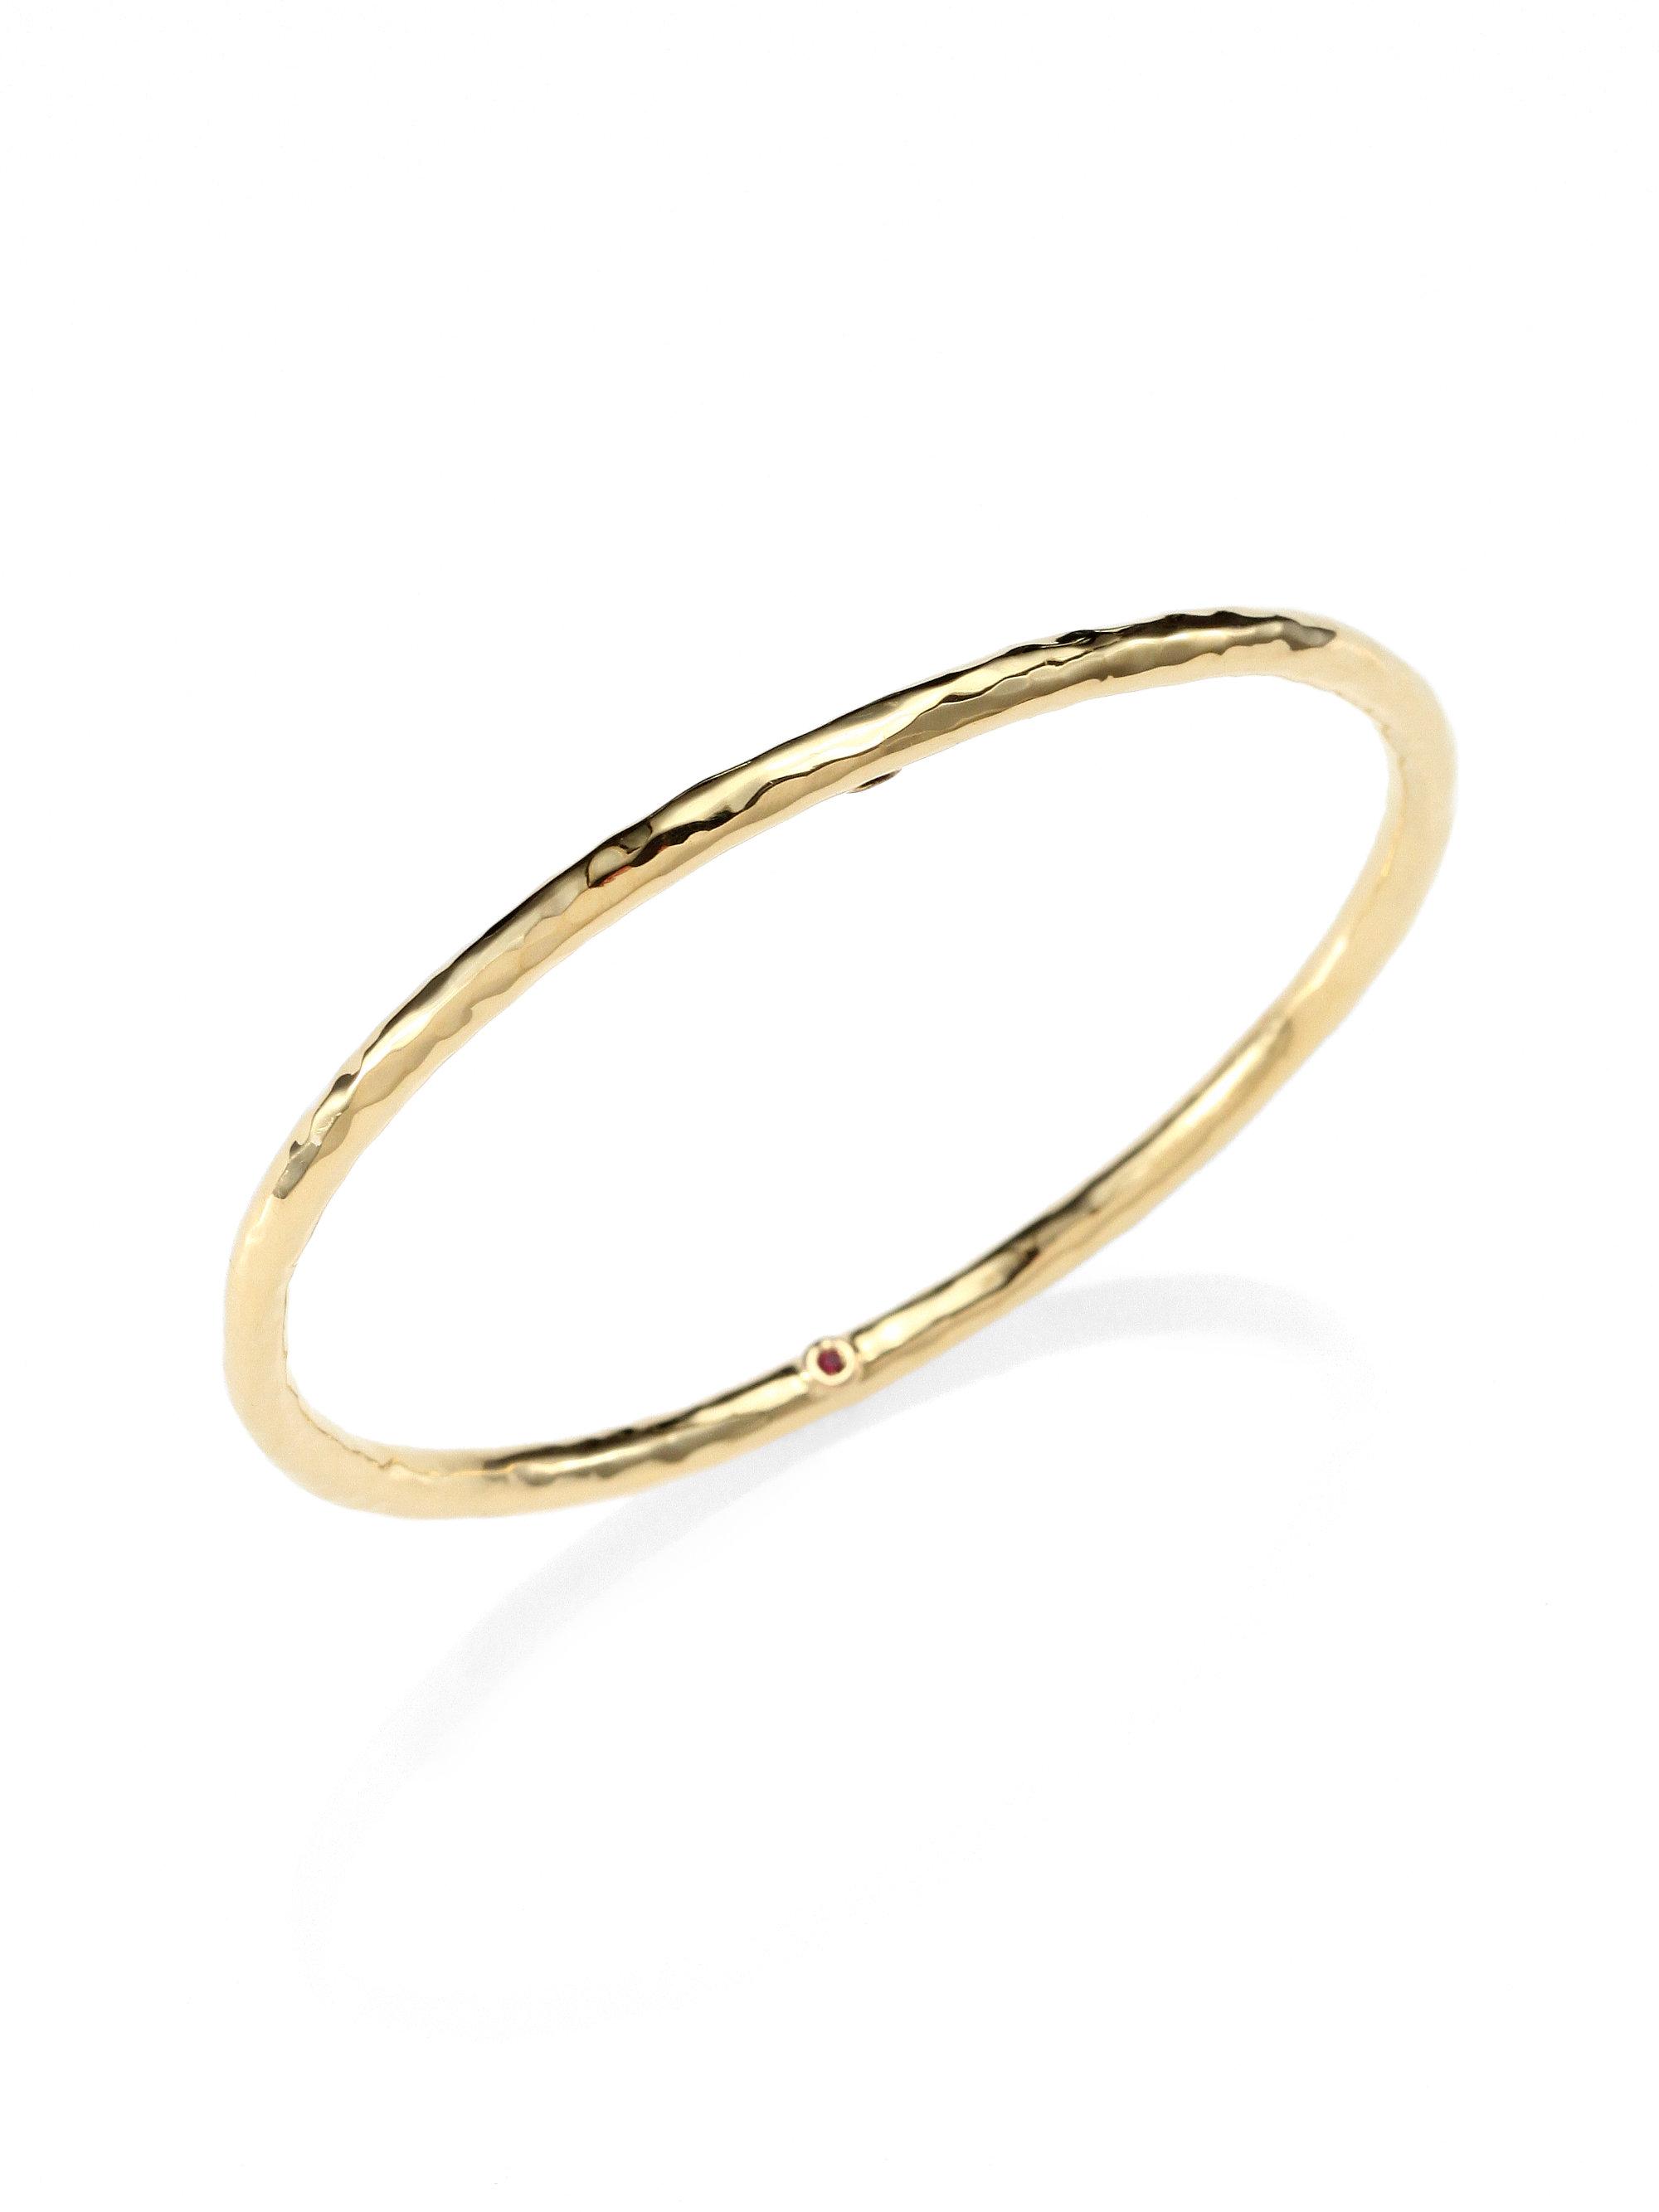 roberto coin martellato 18k yellow gold bangle bracelet in. Black Bedroom Furniture Sets. Home Design Ideas